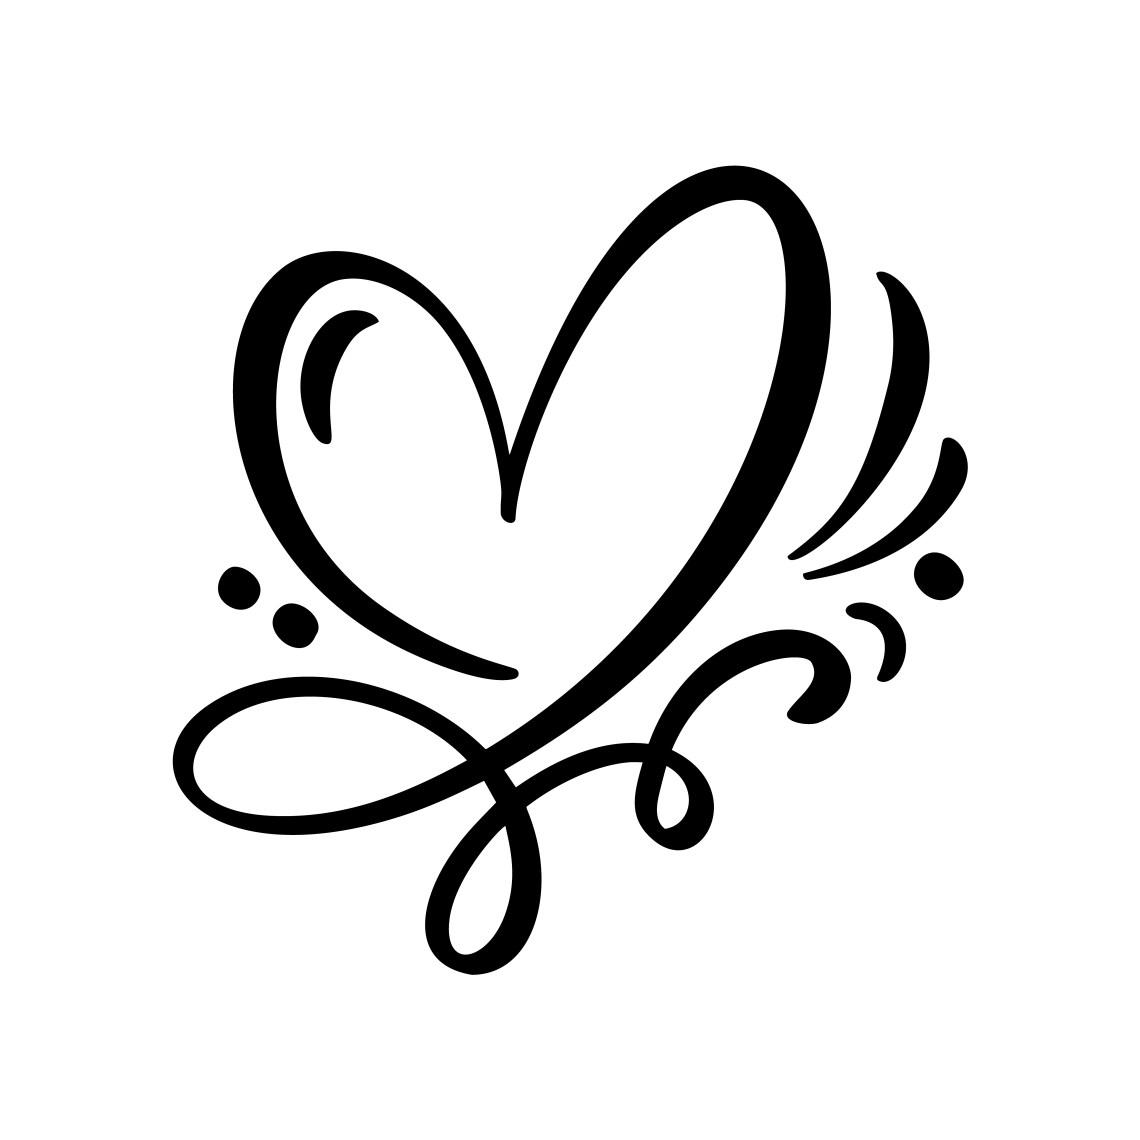 Download Heart love sign illustration - Download Free Vectors ...